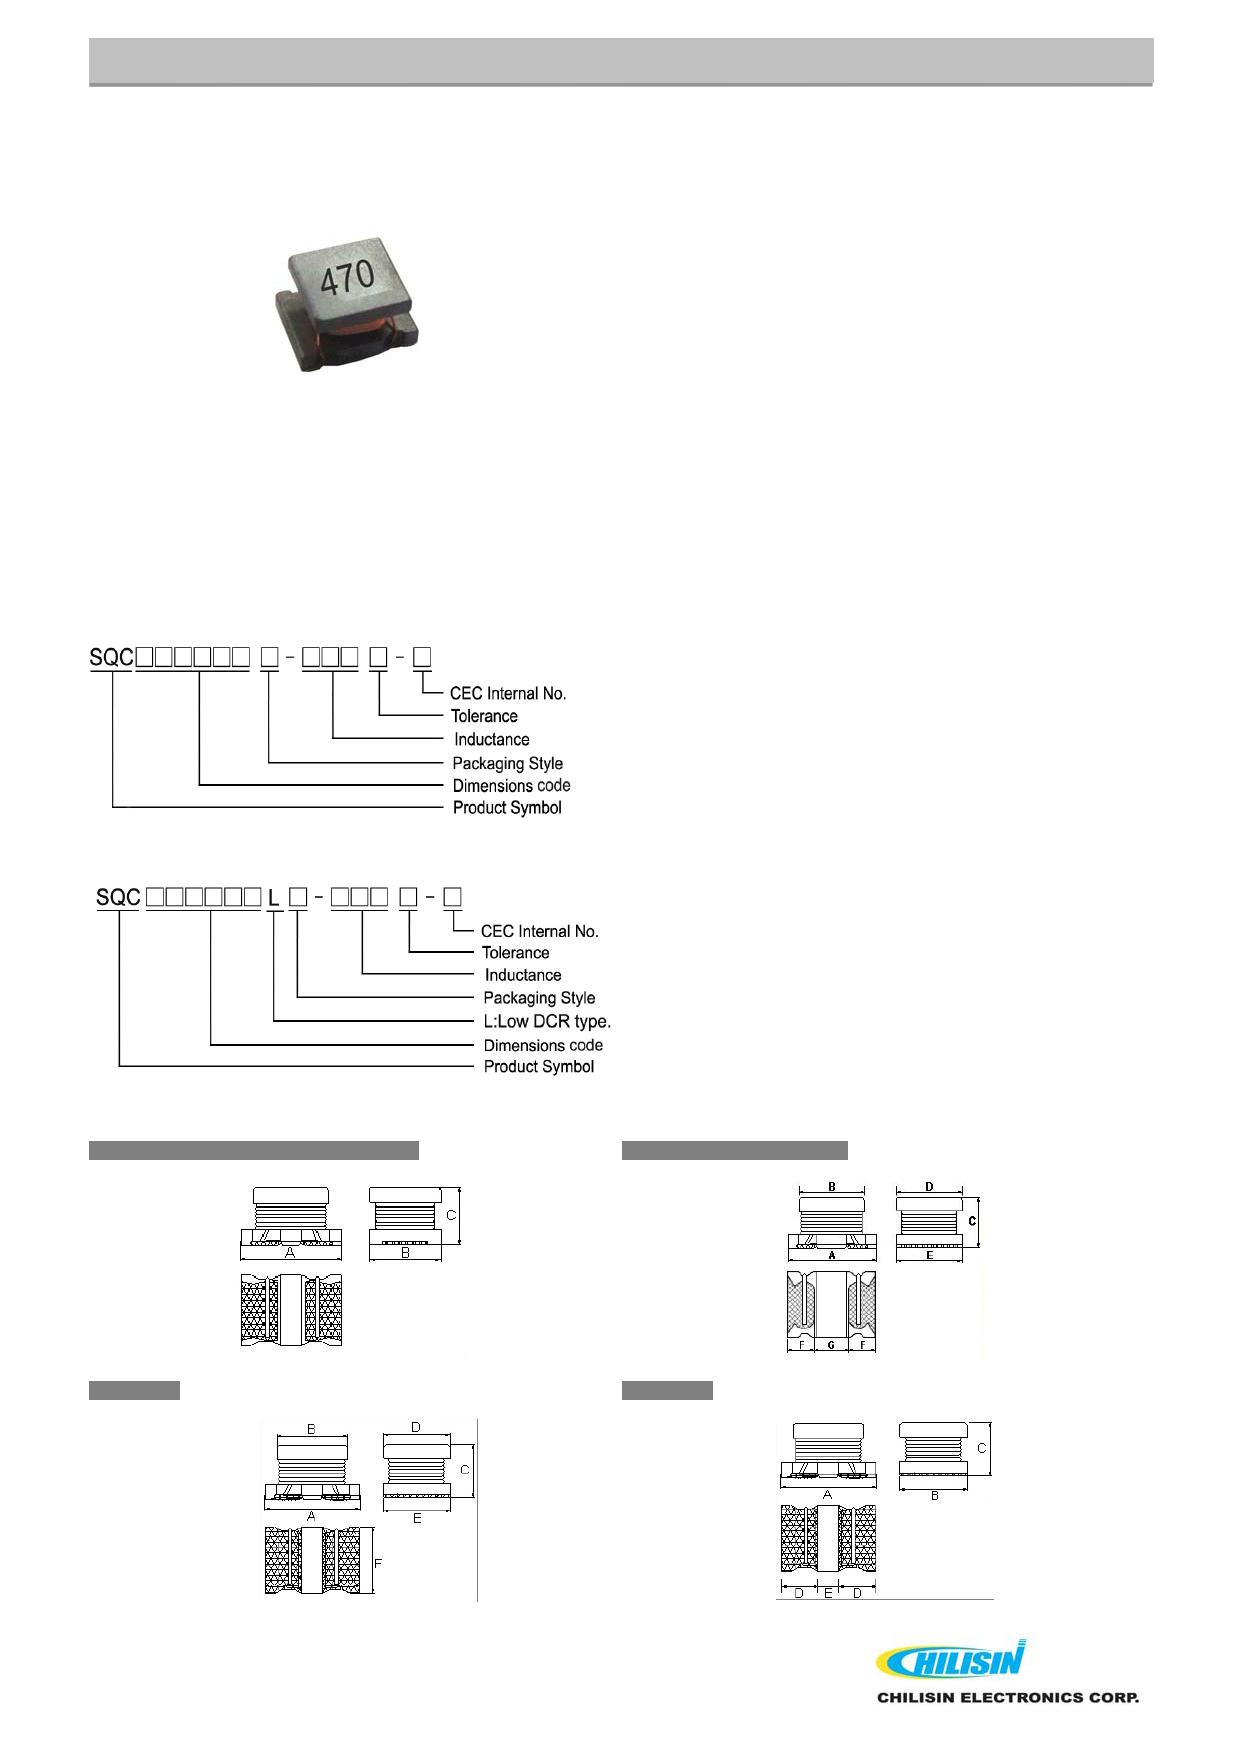 SQC453226T 데이터시트 및 SQC453226T PDF